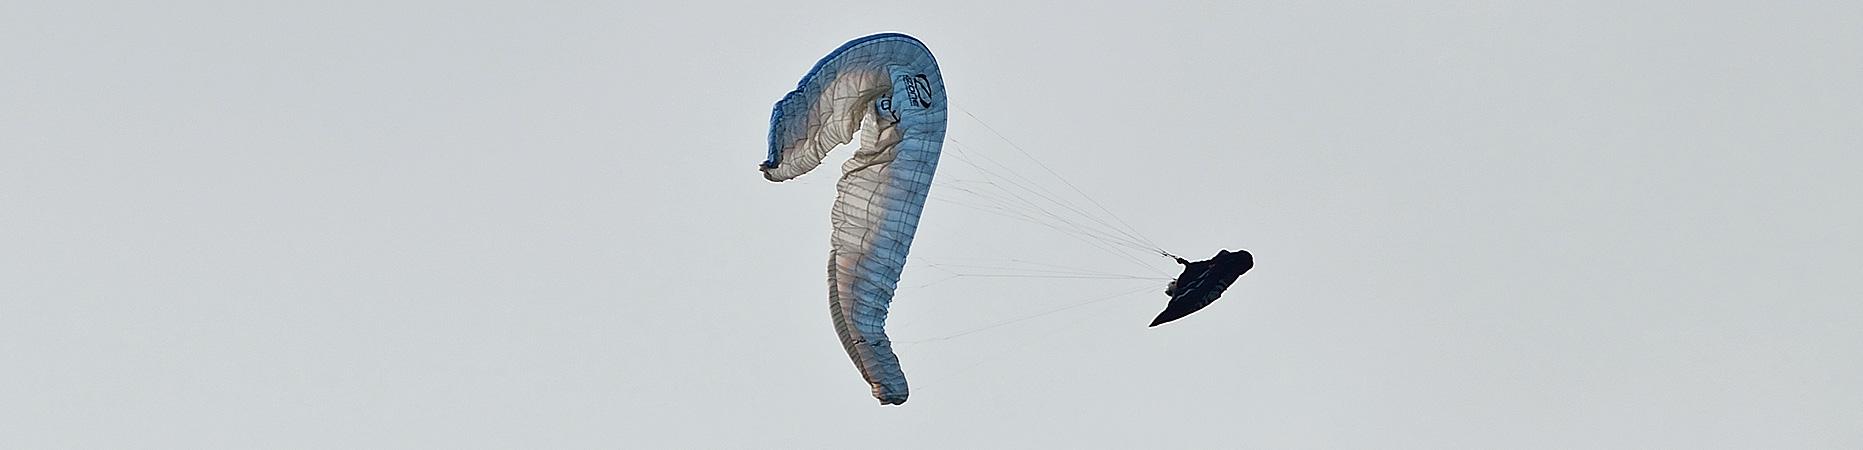 X-dream Fly Siku Manöver